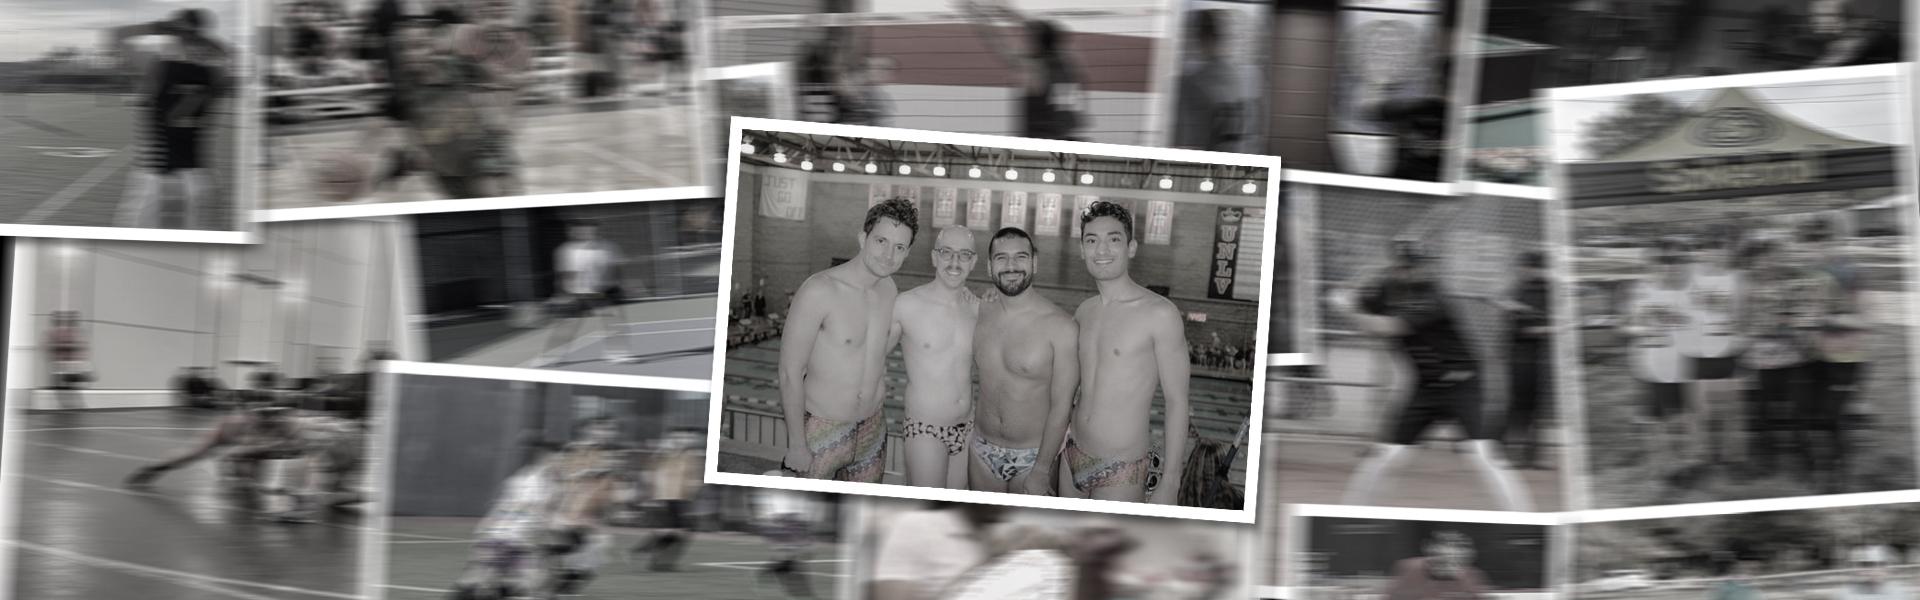 Swimming - 2022